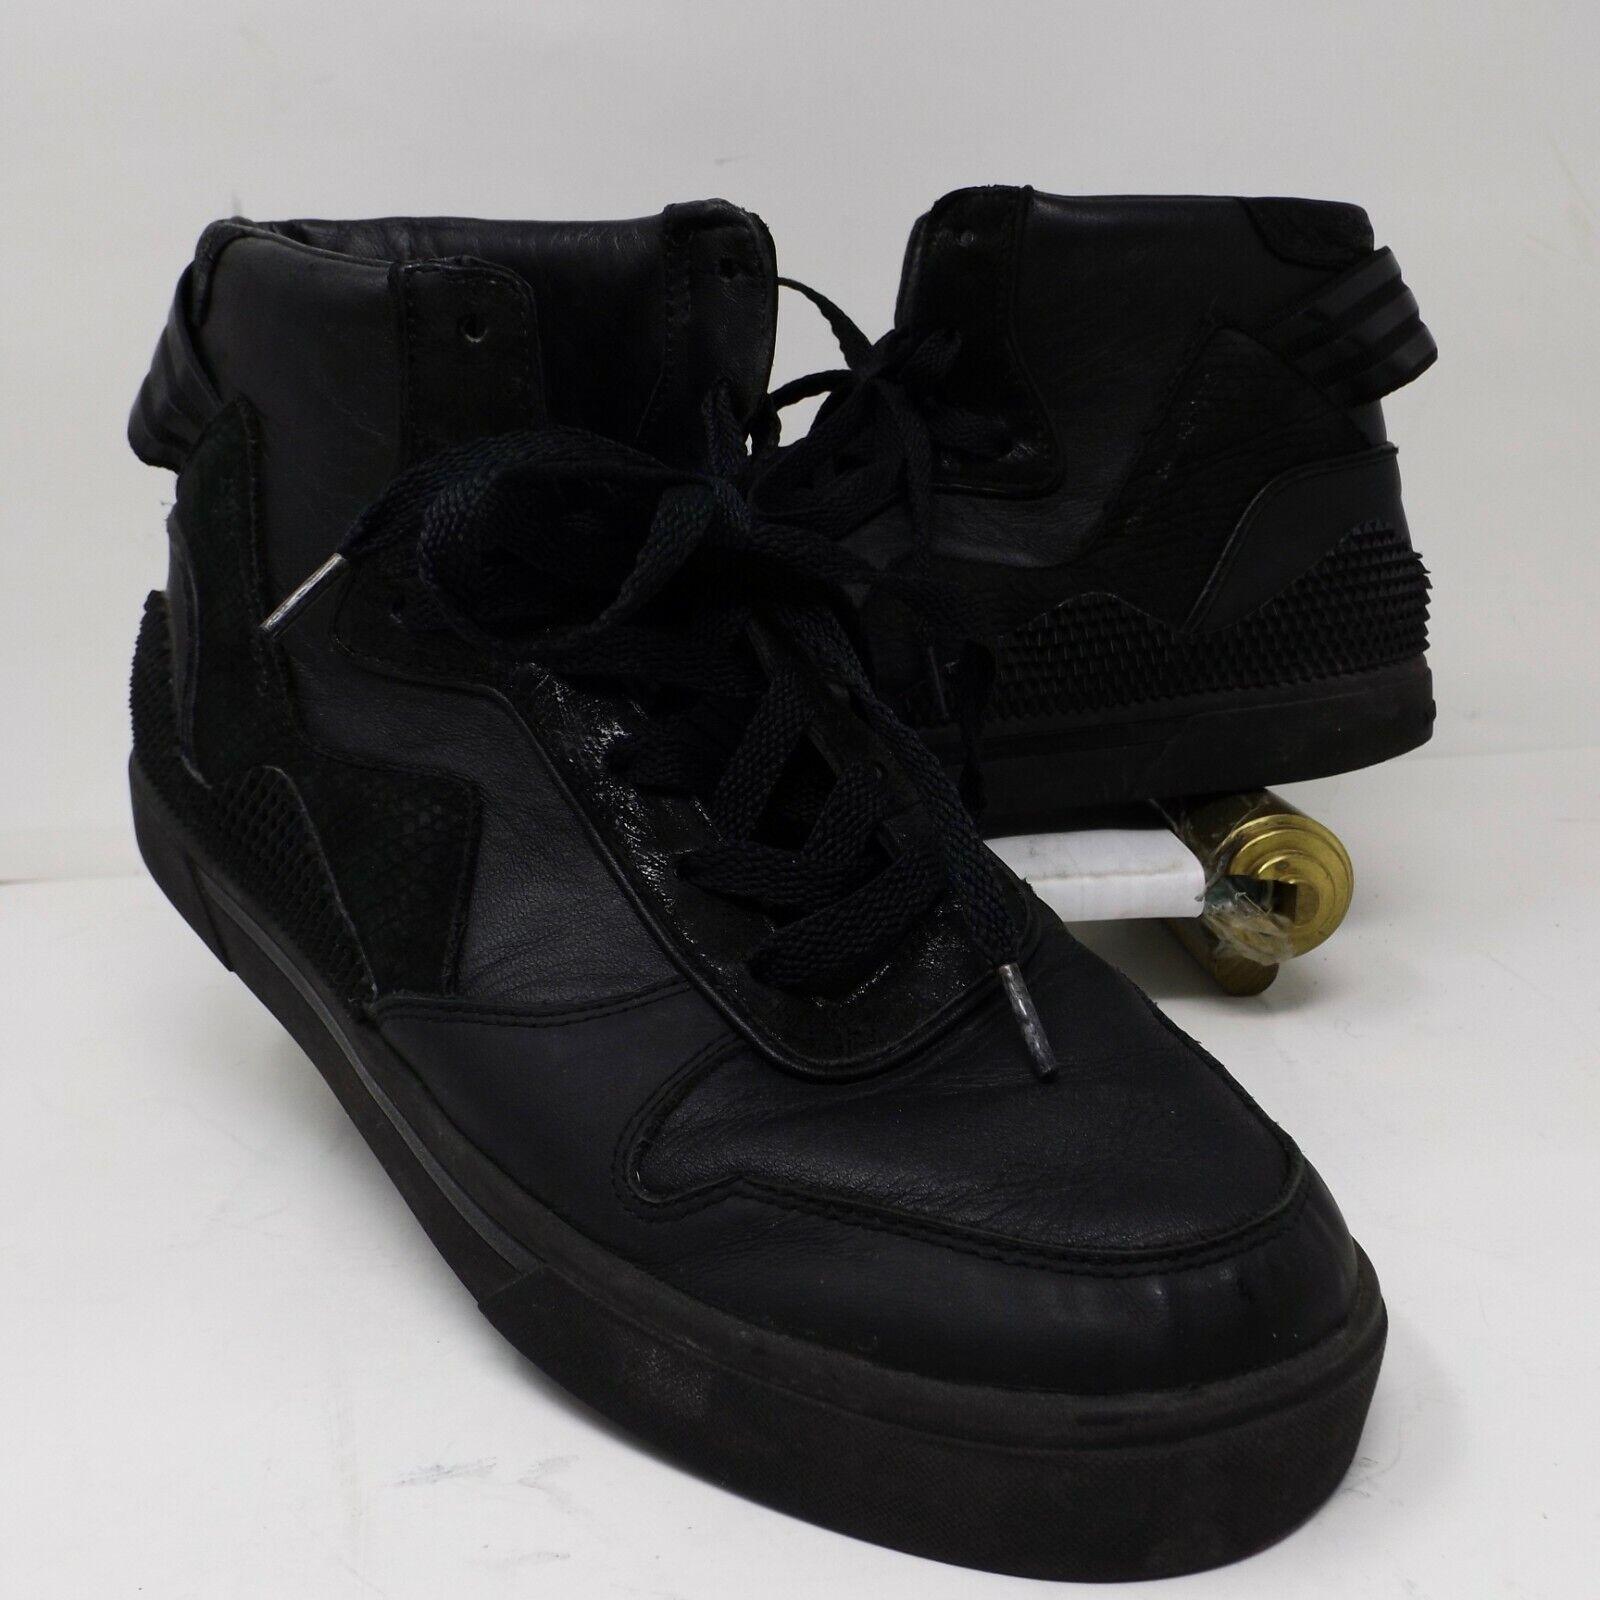 y3 black trainers